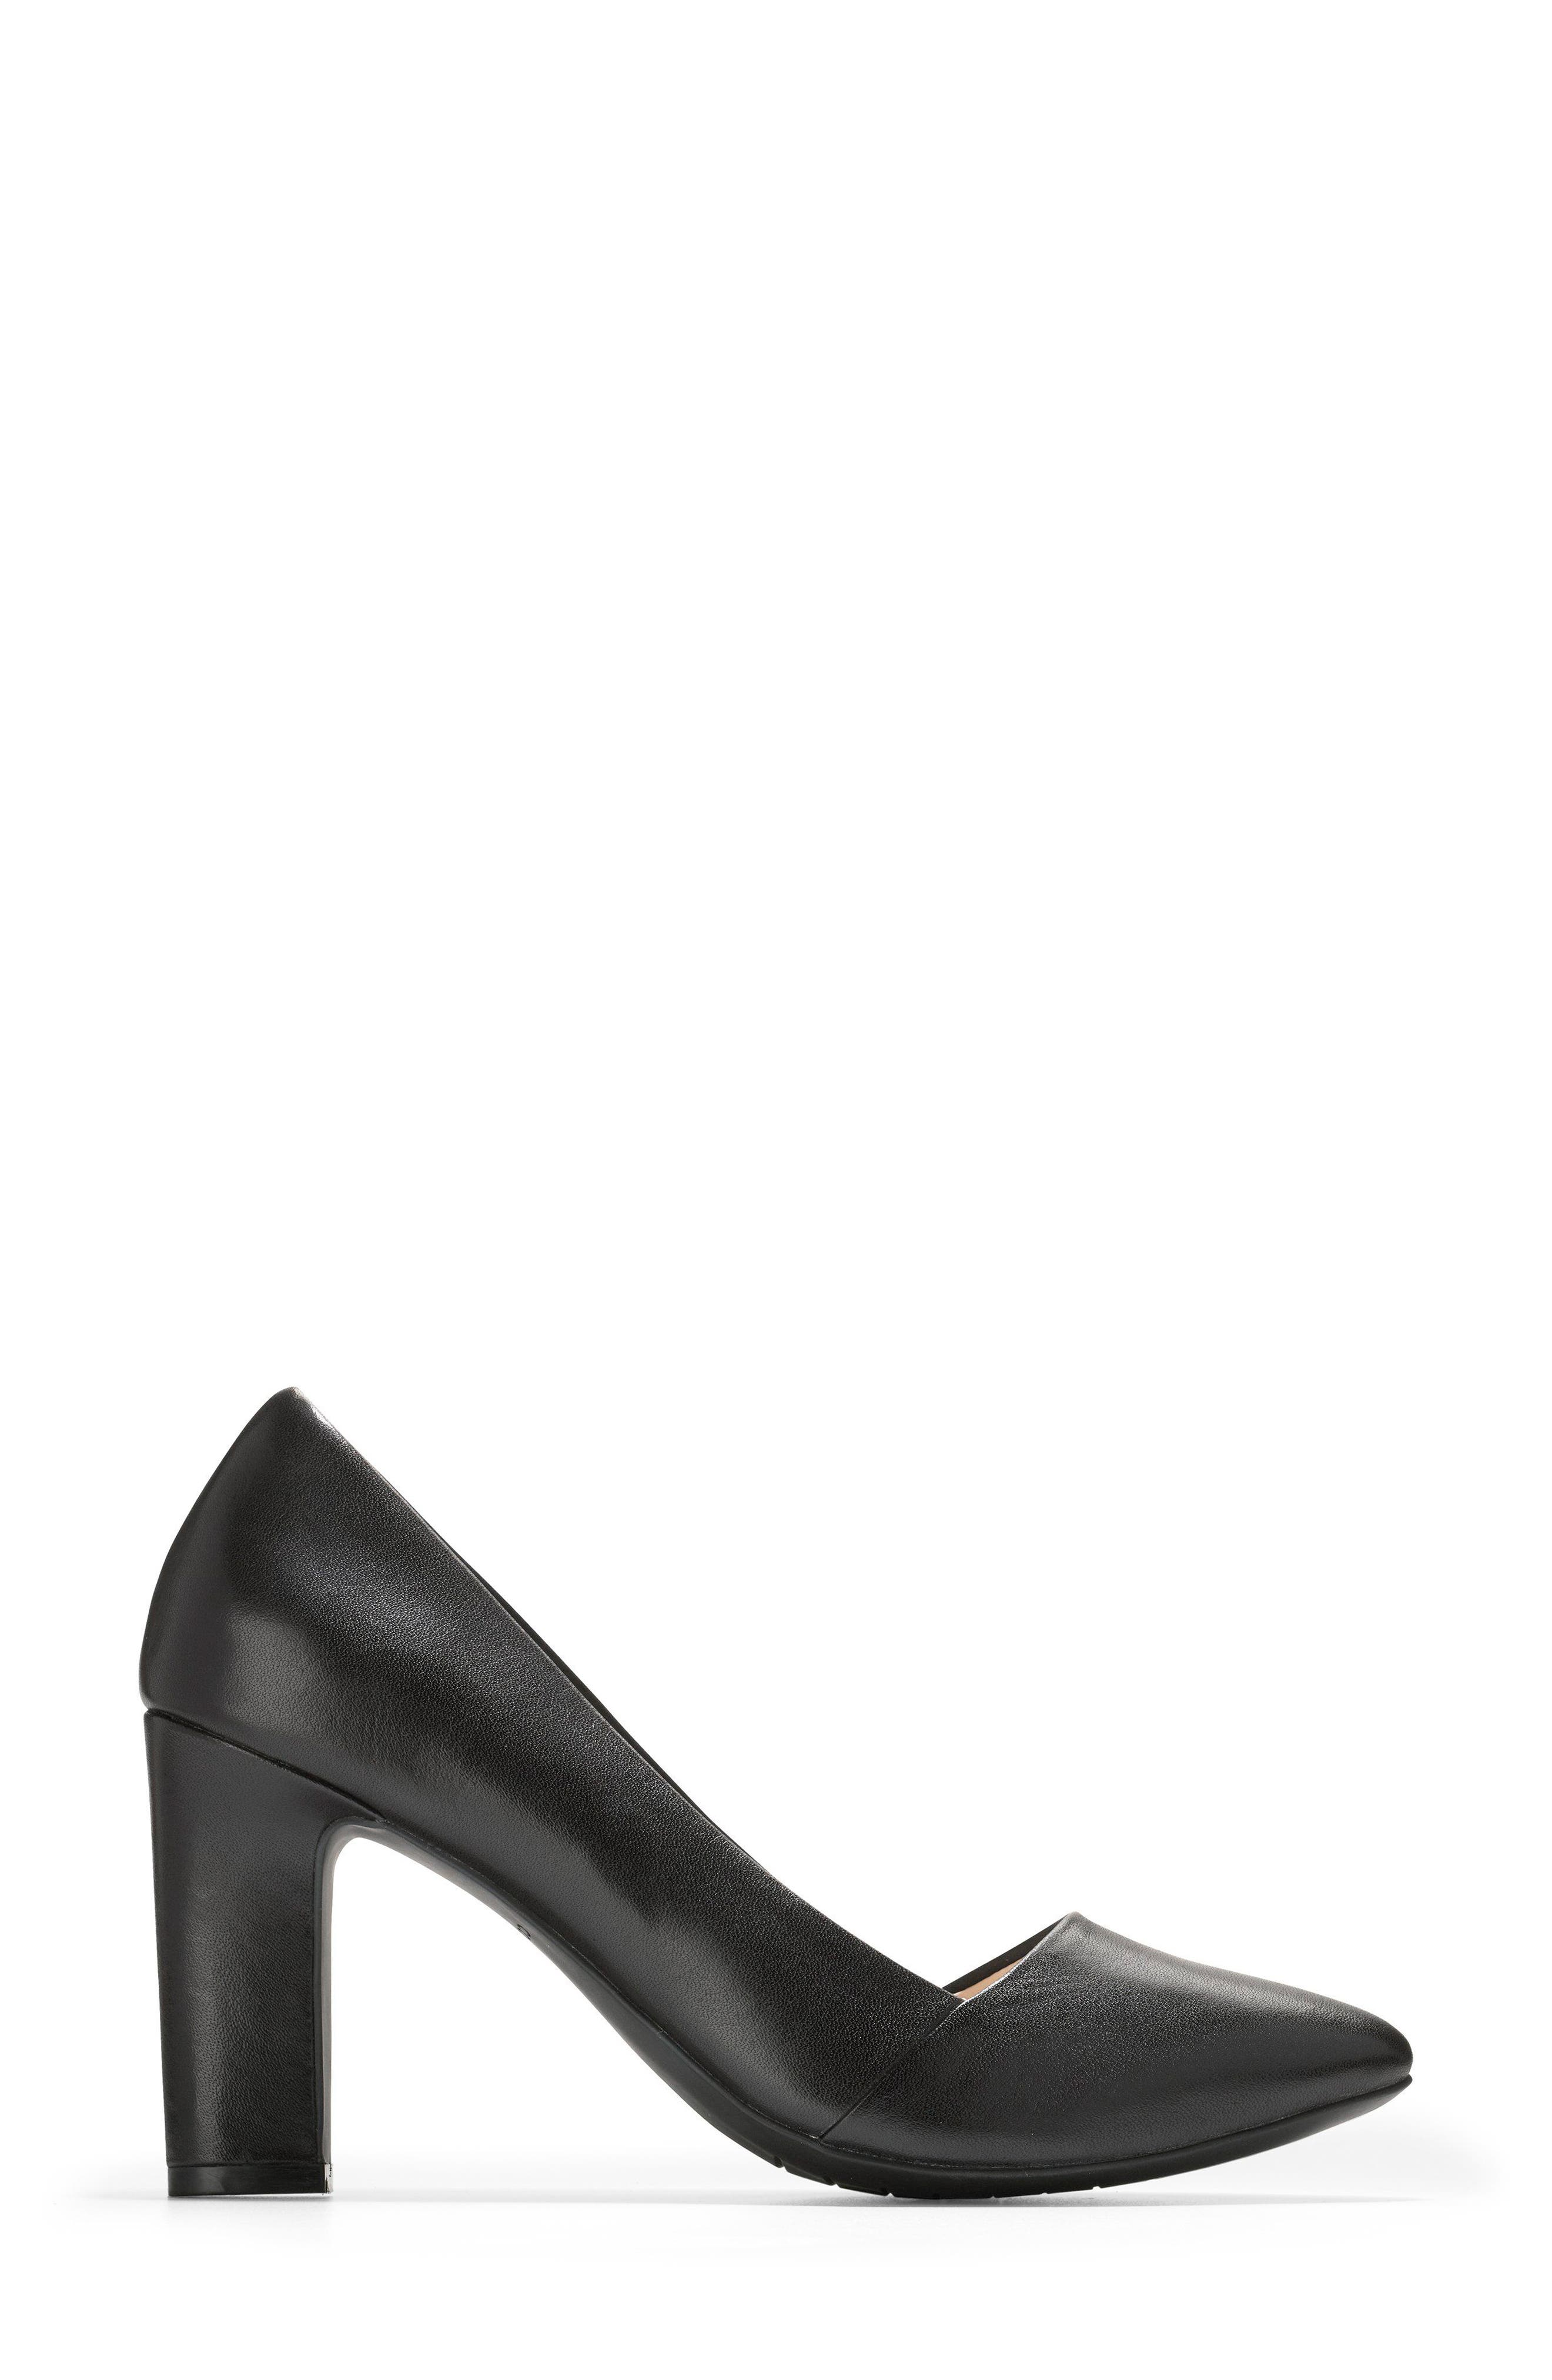 Kinslee Pump,                             Alternate thumbnail 3, color,                             Black Leather